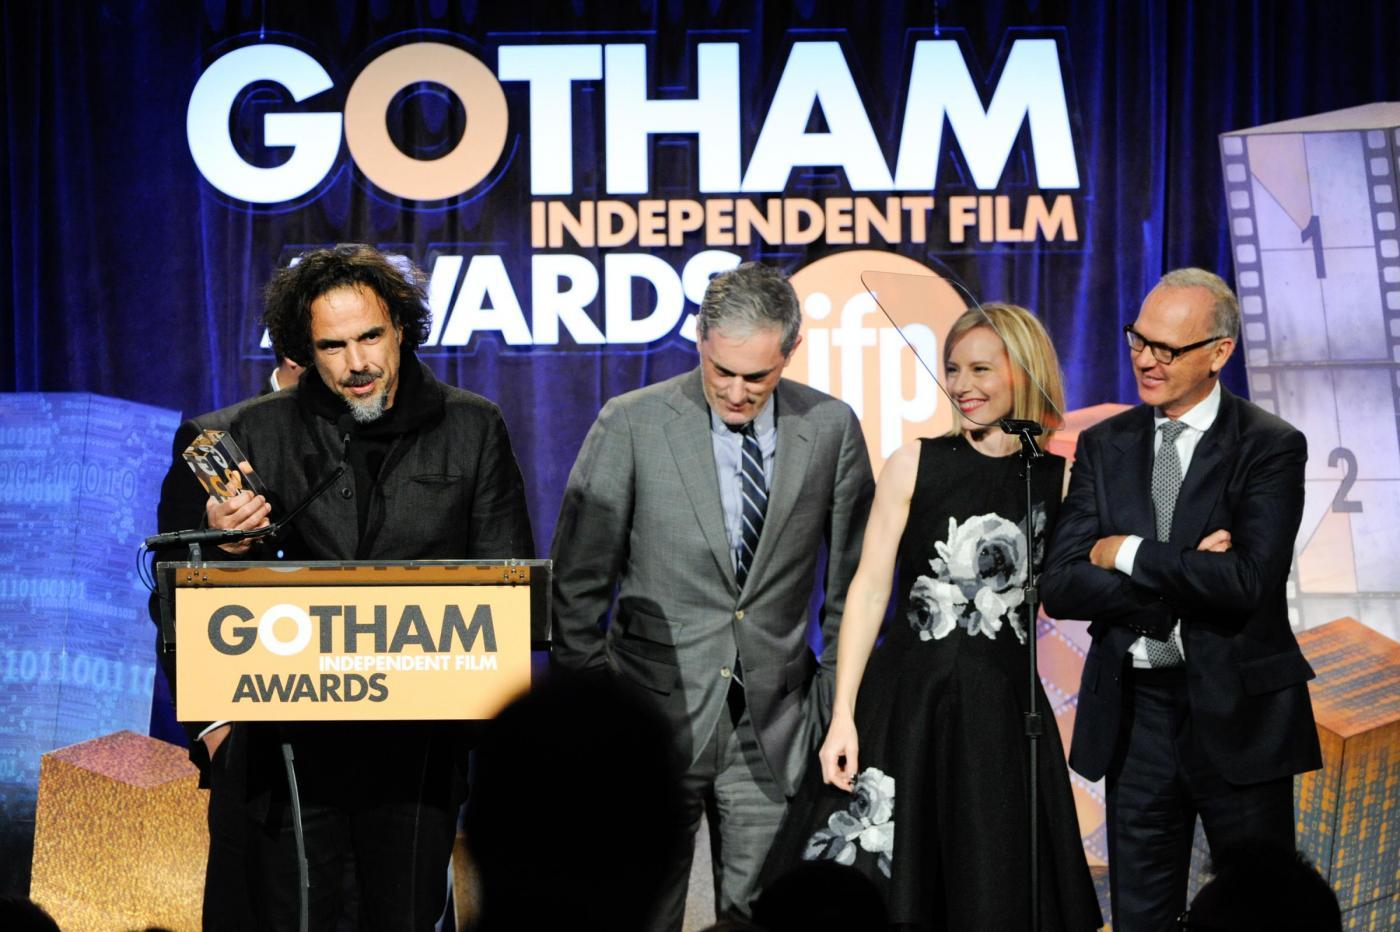 Gotham Awards 2014: vincitori Birdman, Michael Keaton e Julianne Moore